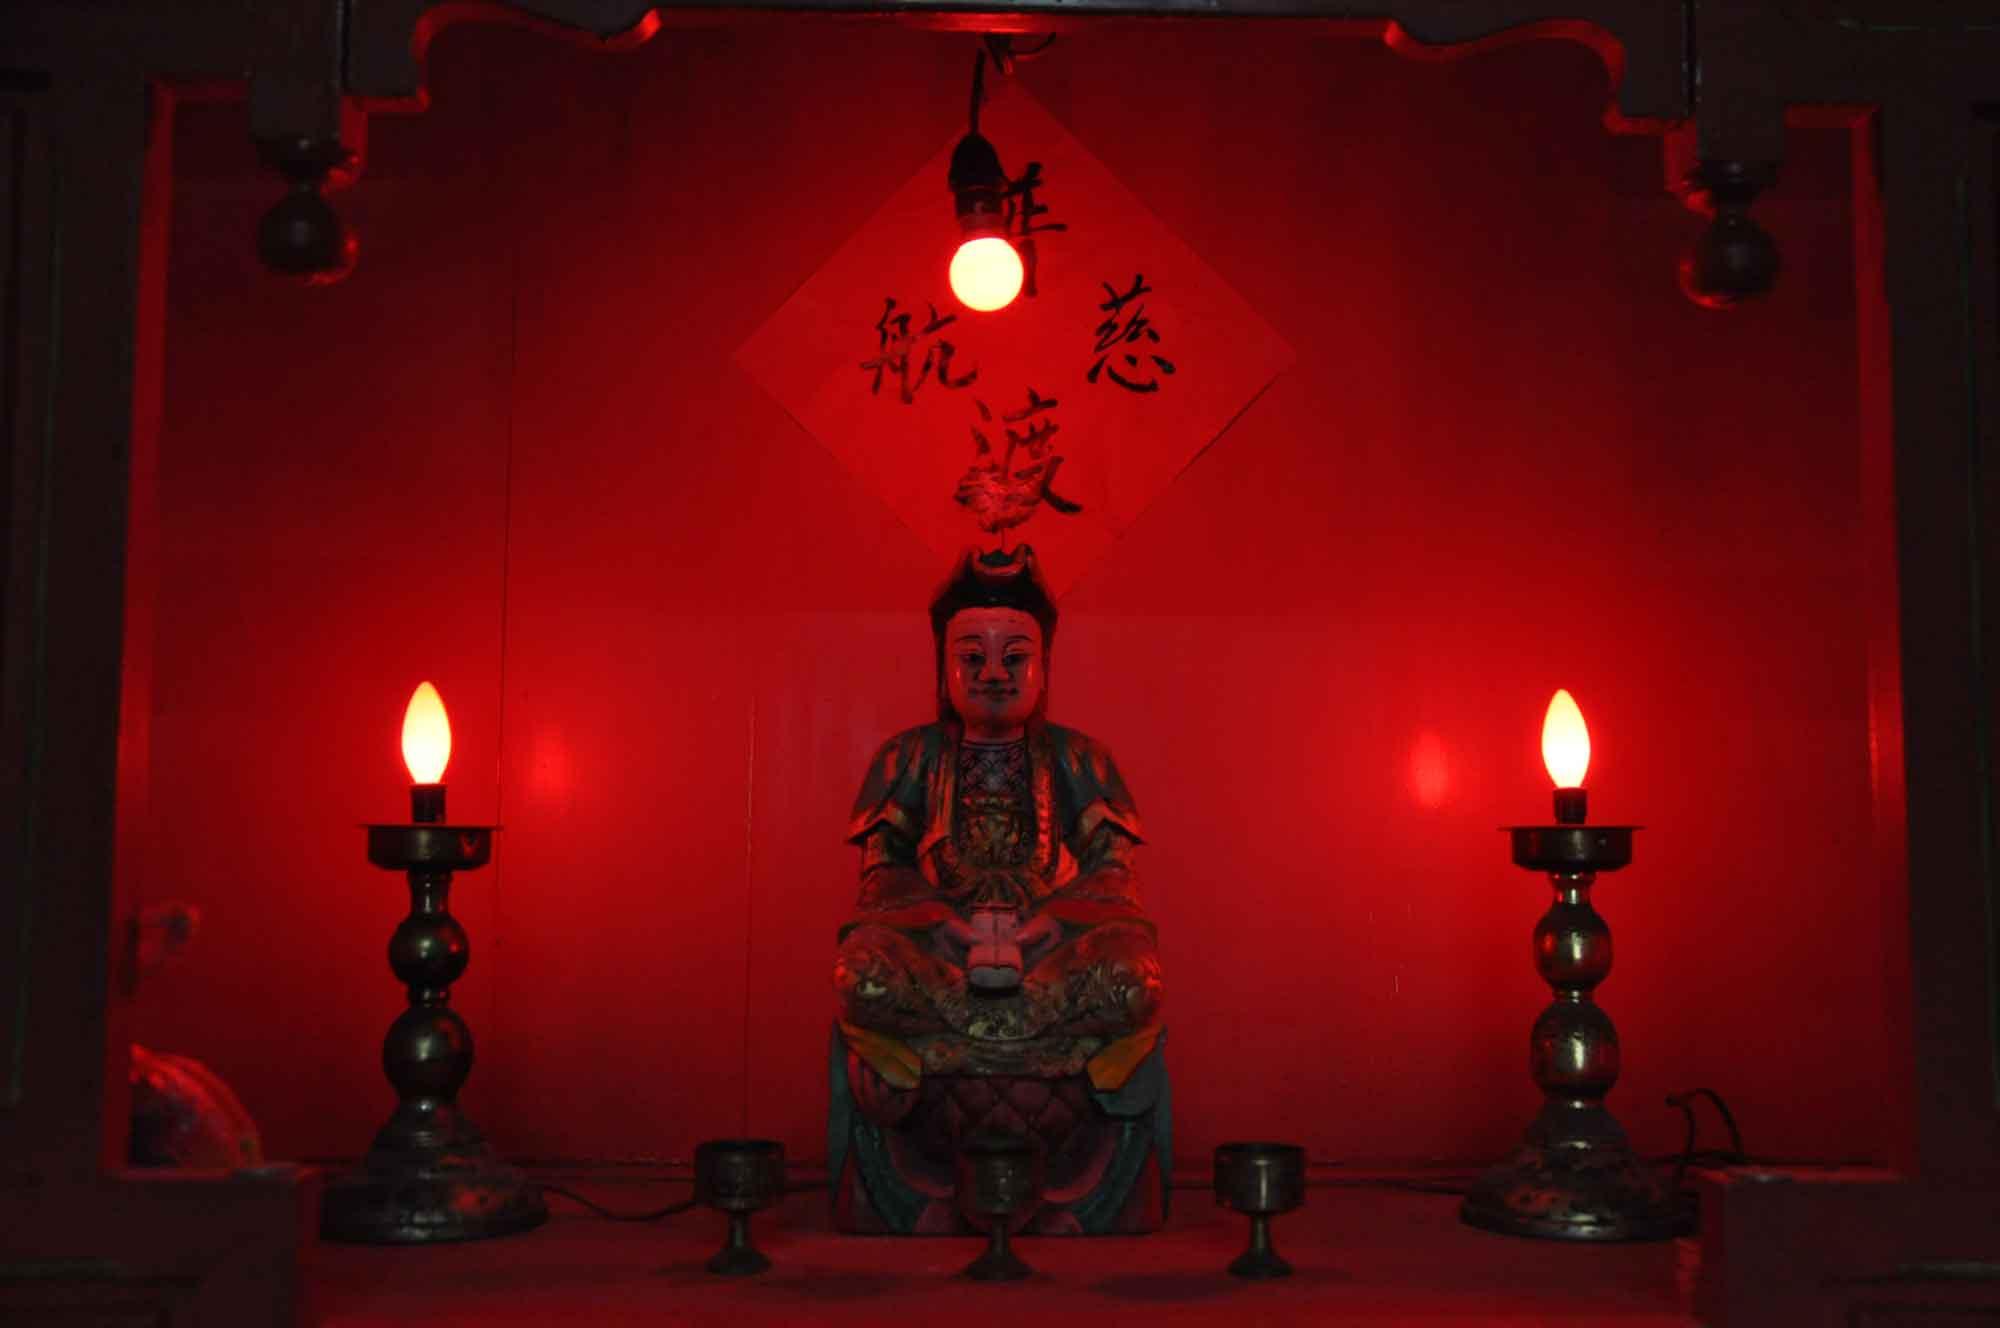 Coloane Temples: Kun Iam Temple altar